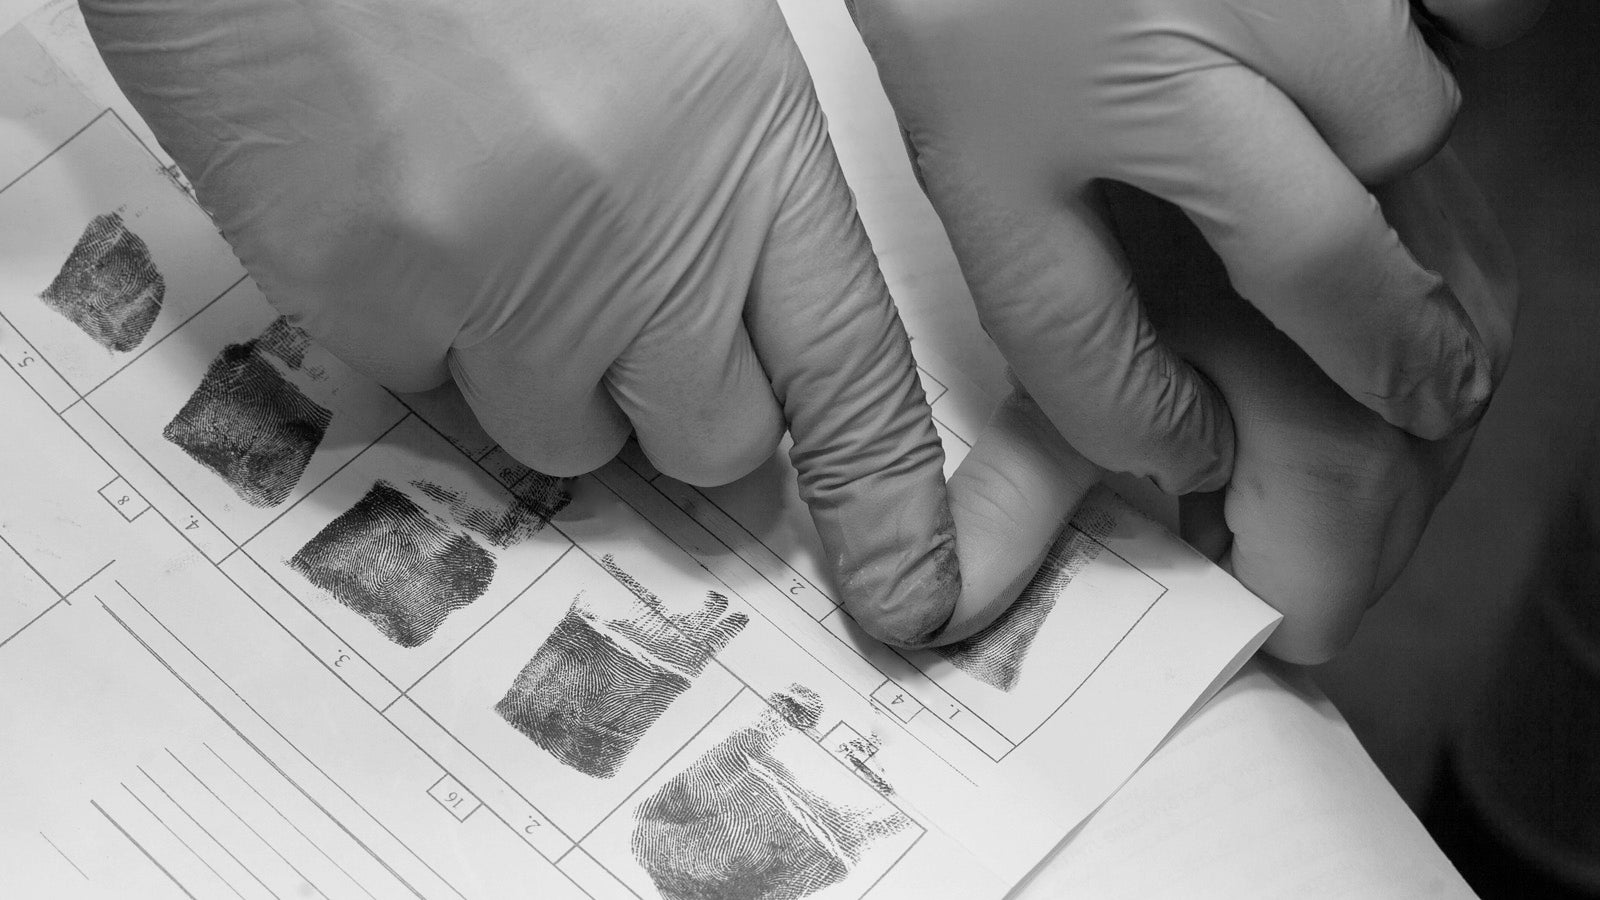 Black and white photo of ink fingerprints being taken